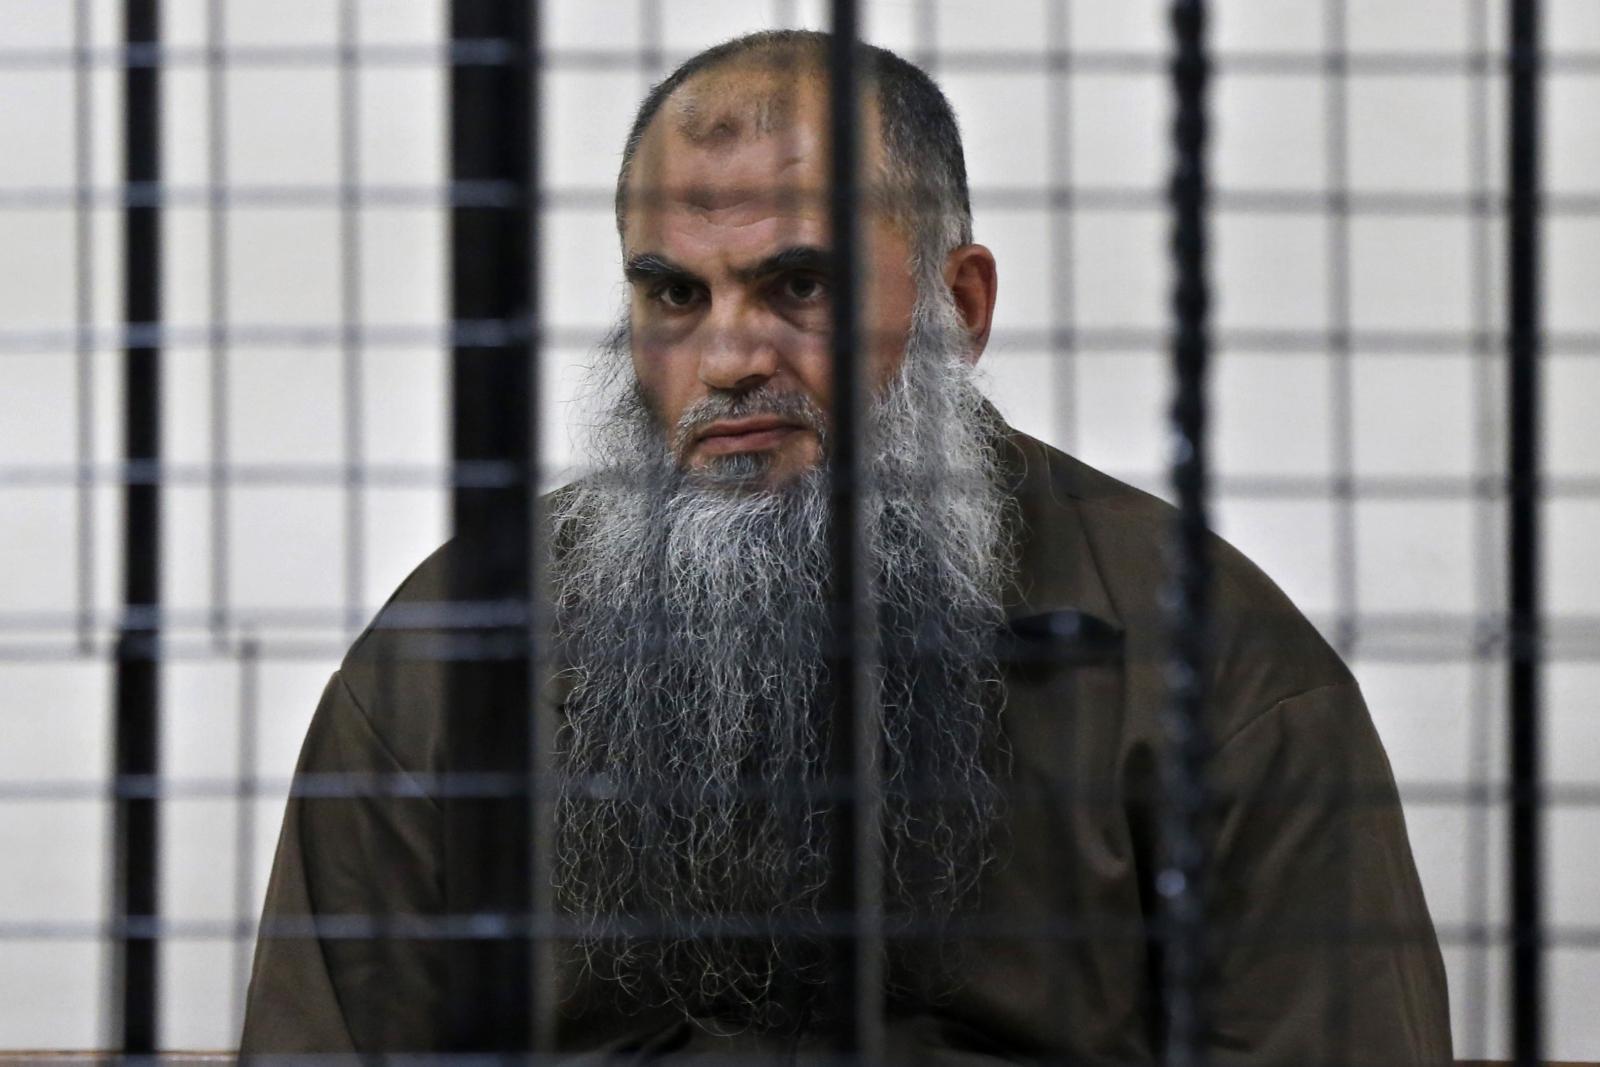 Radical Muslim cleric Abu Qatada condemns Isis